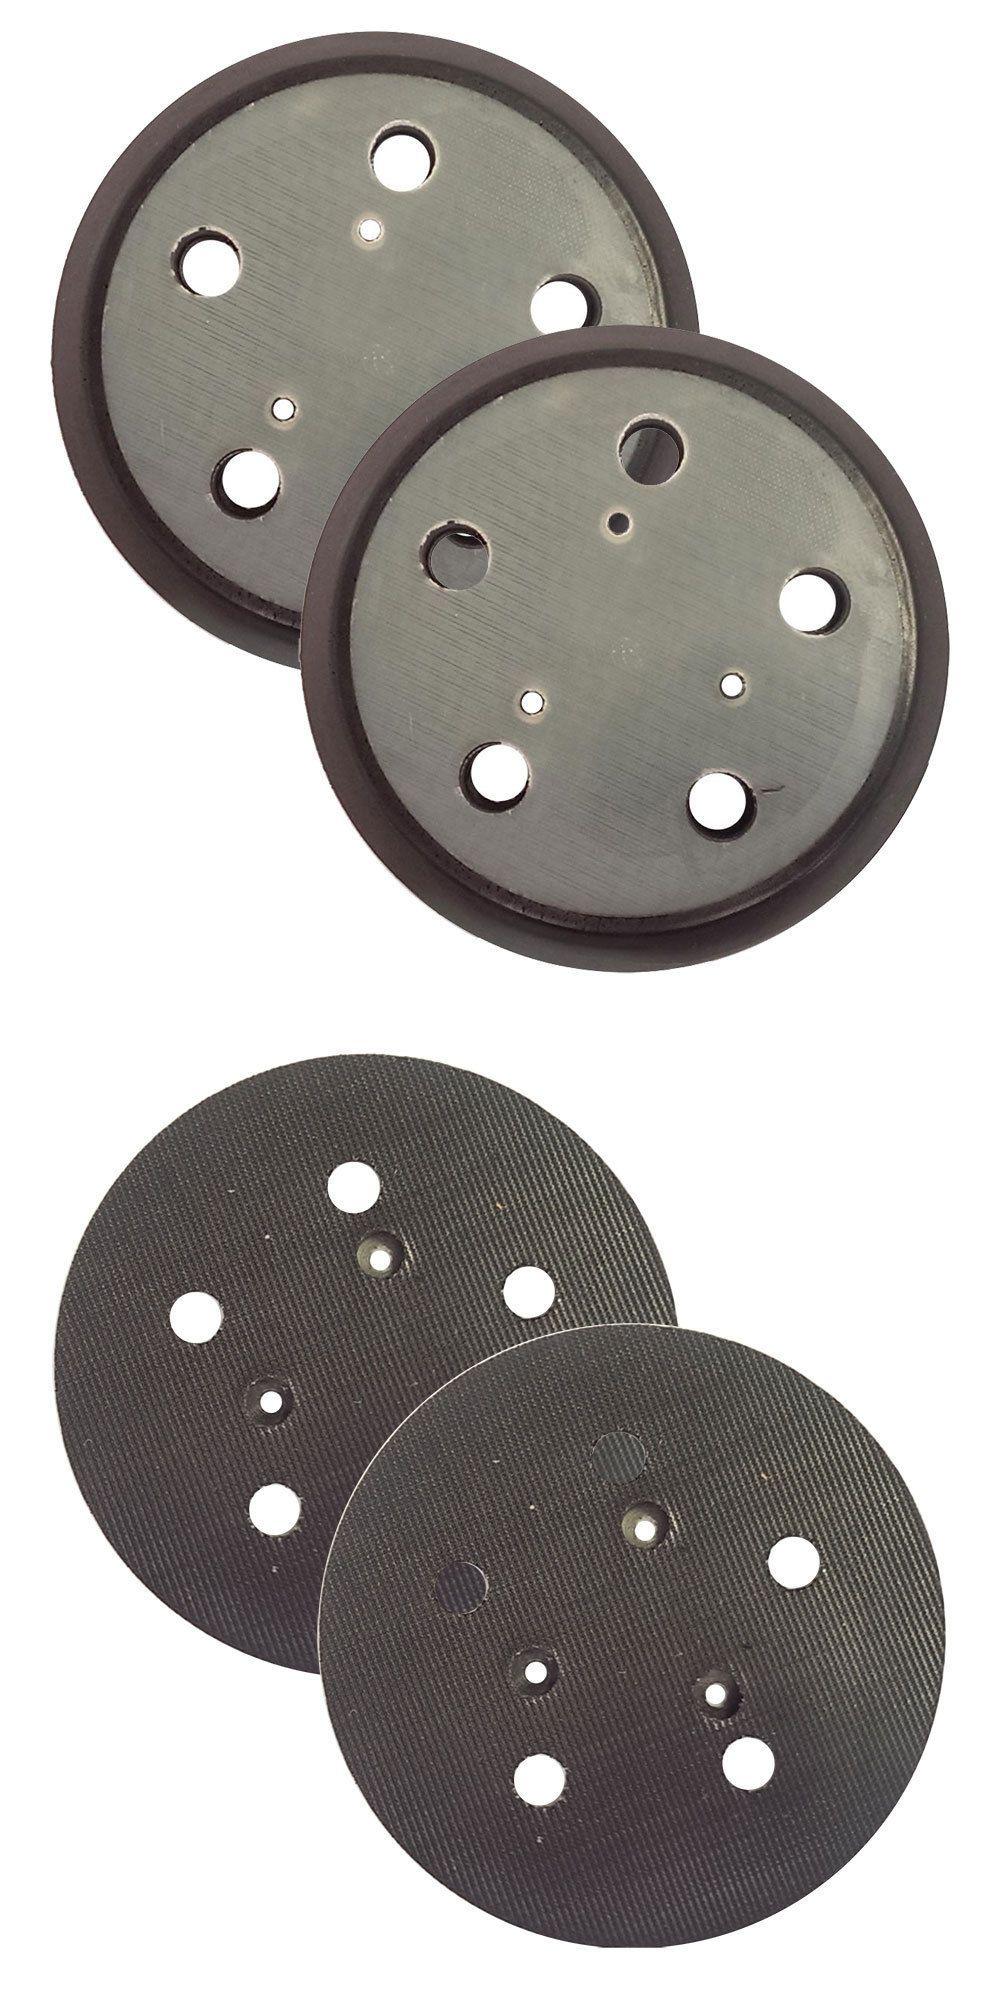 Sander Parts And Accessories 20796 Sander Pad 5 Inch Hook And Loop